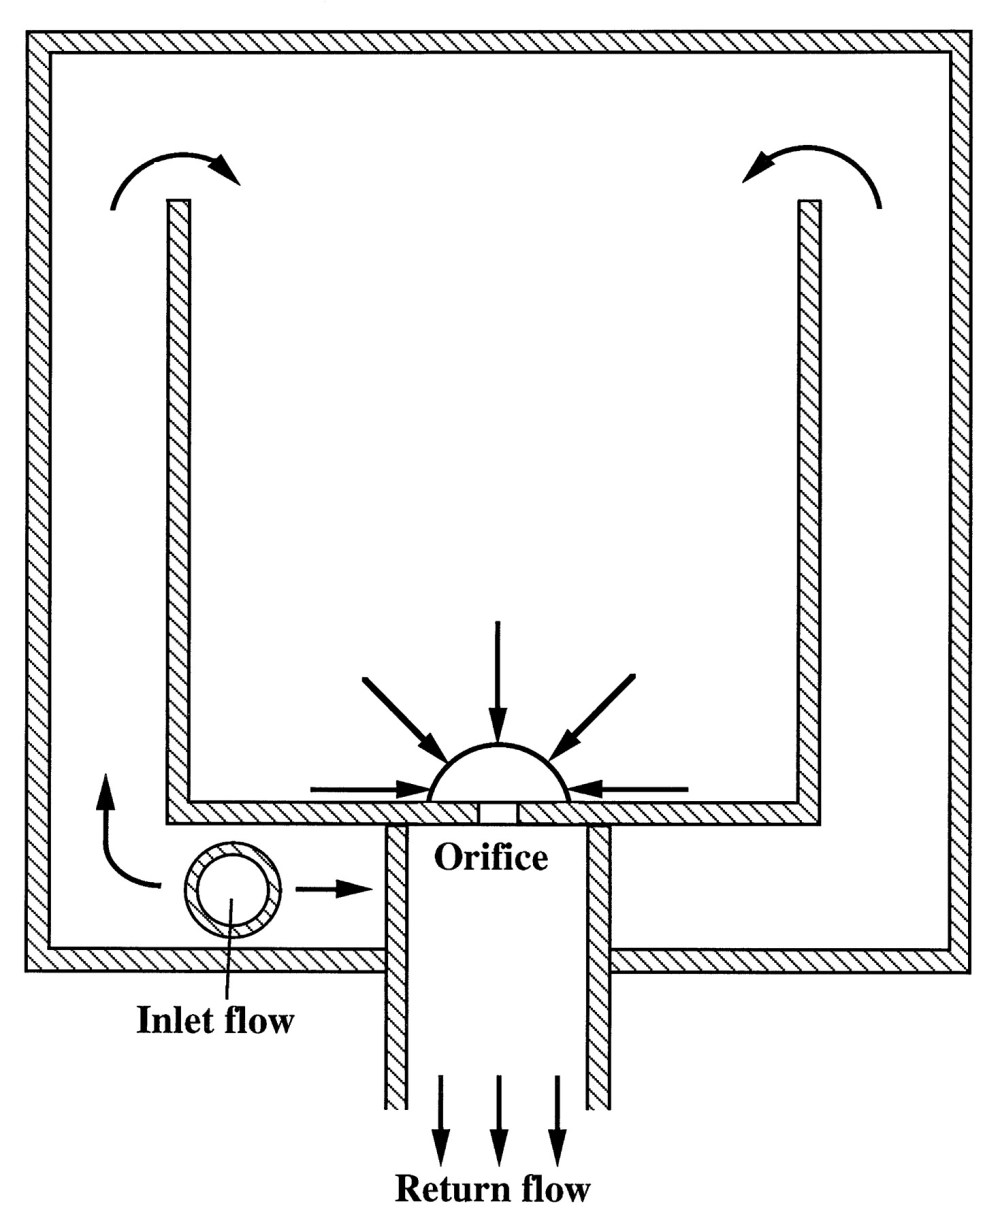 medium resolution of download figure download powerpoint